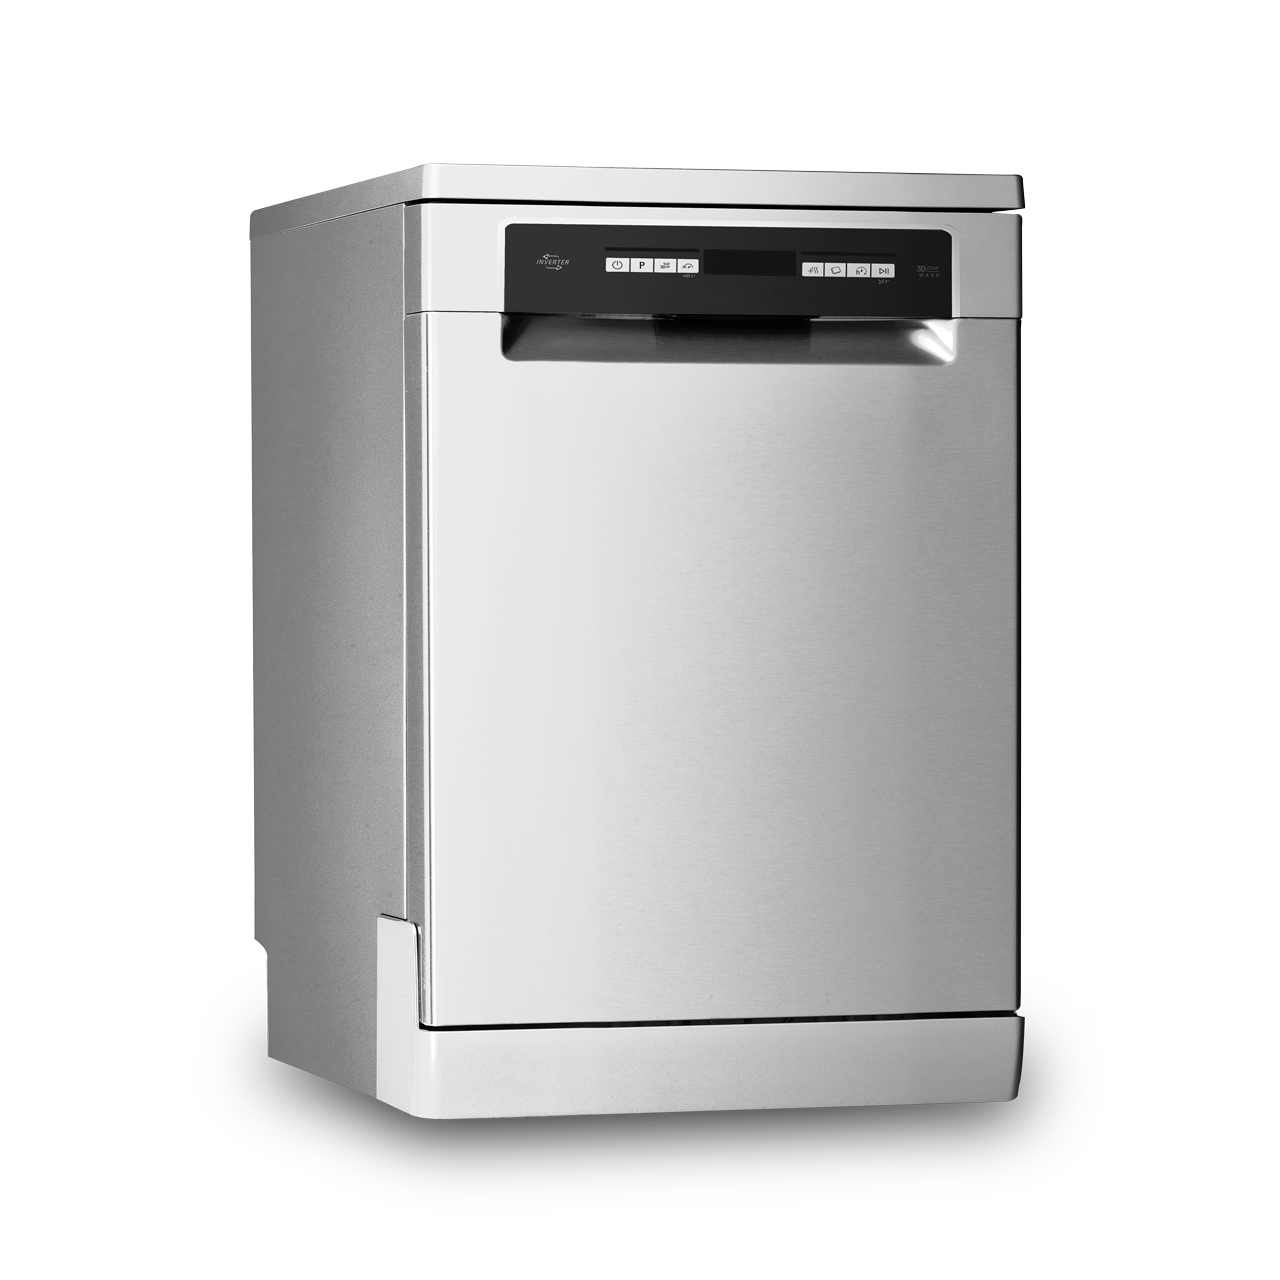 Stainless steel GE dishwasher